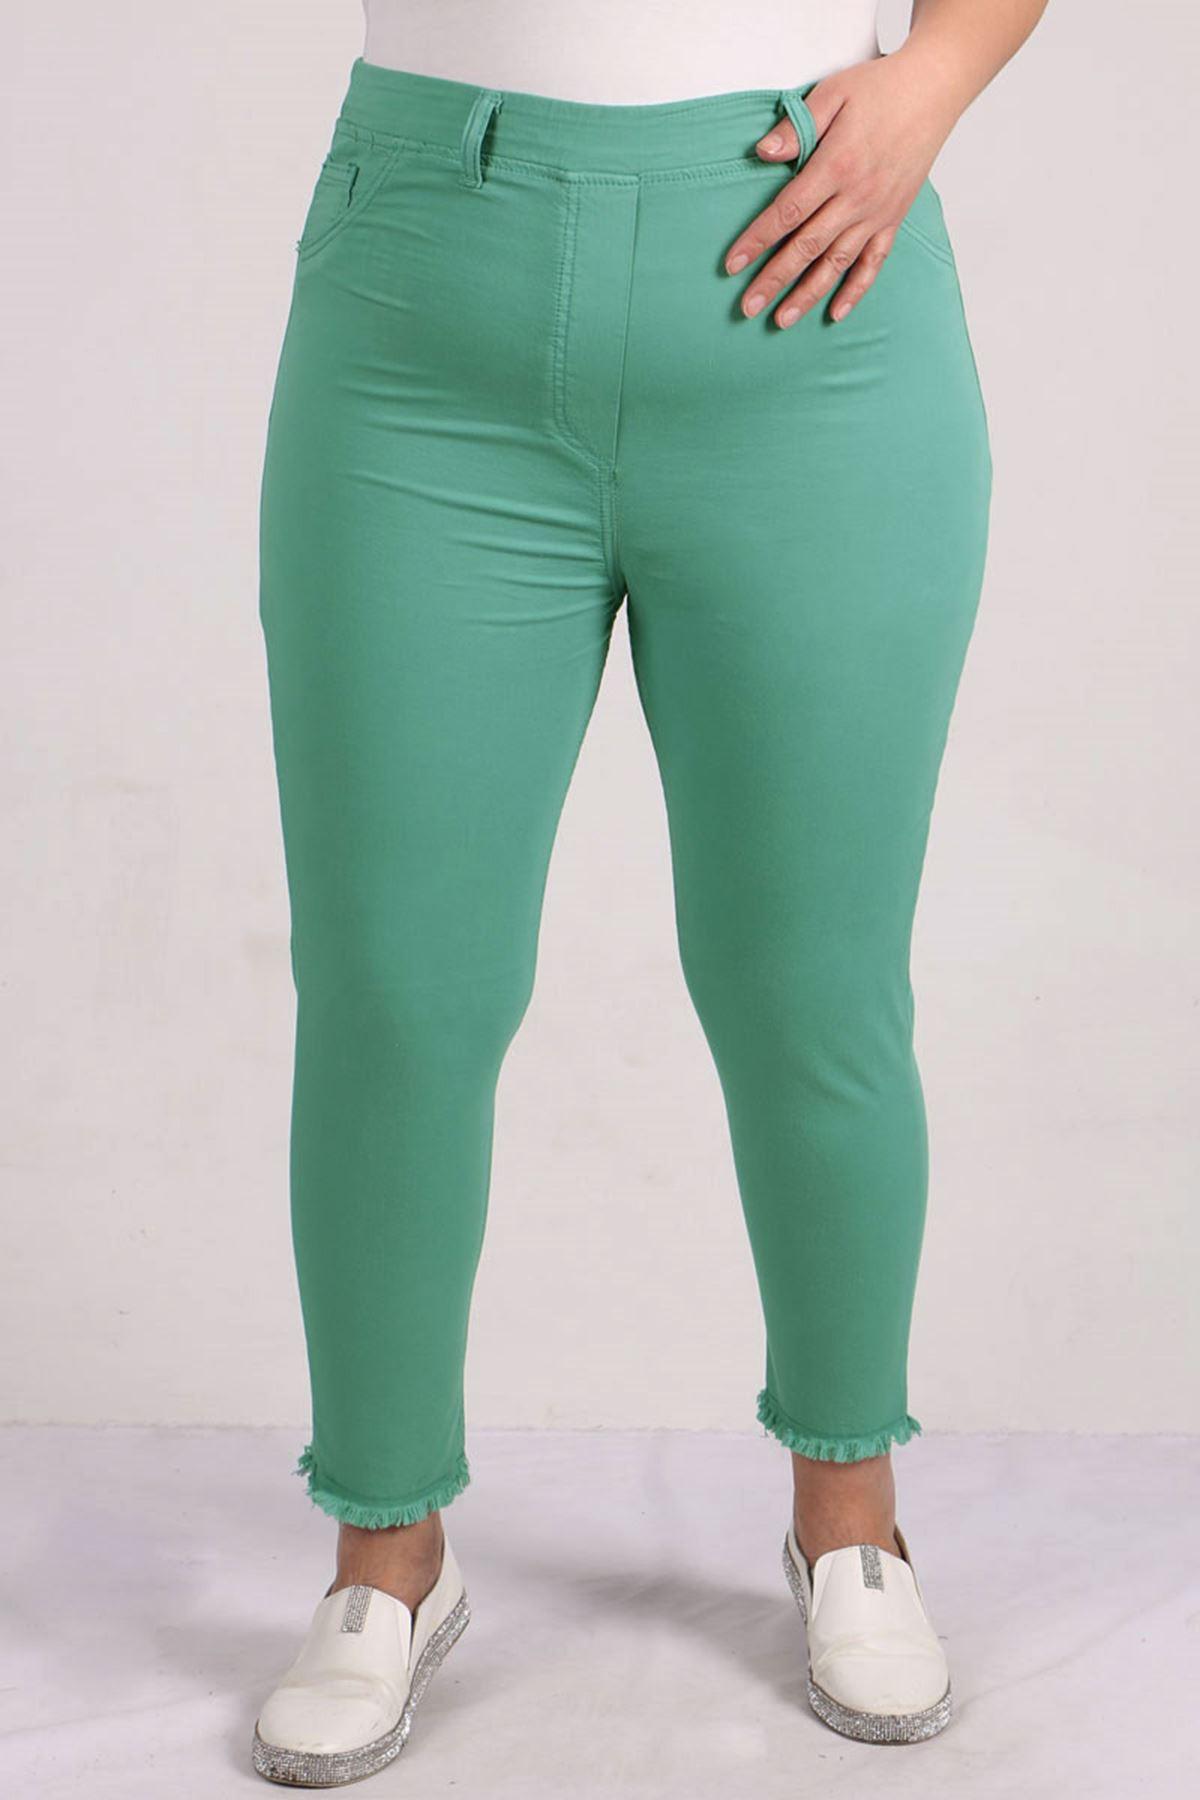 9151 Tasseled Skinny Leg Plus Size Pants - Naphtha Green